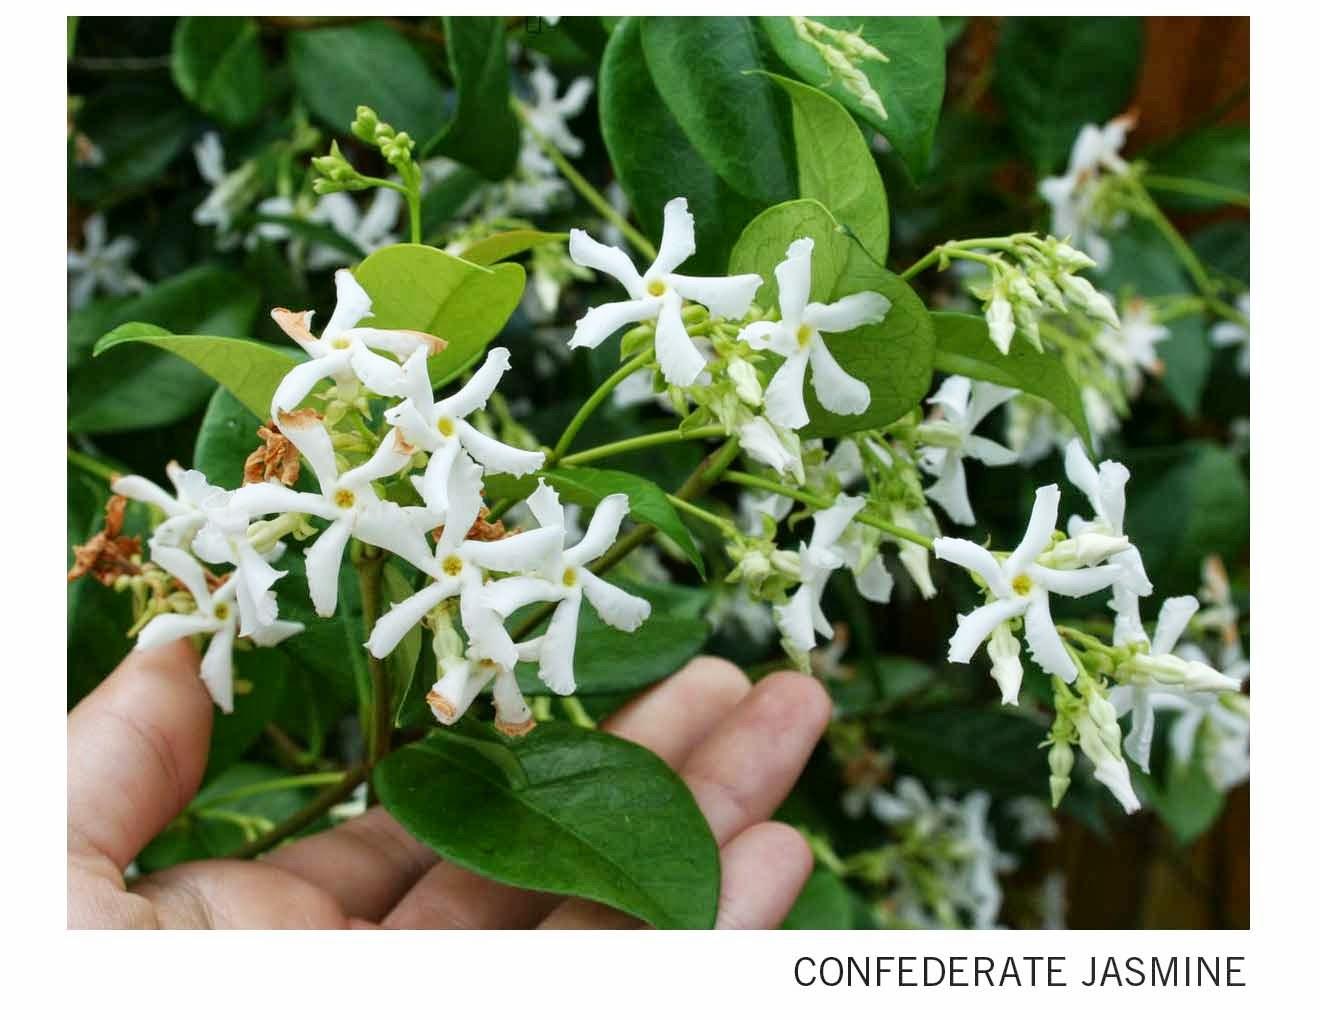 Confederate-Jasmine.jpg